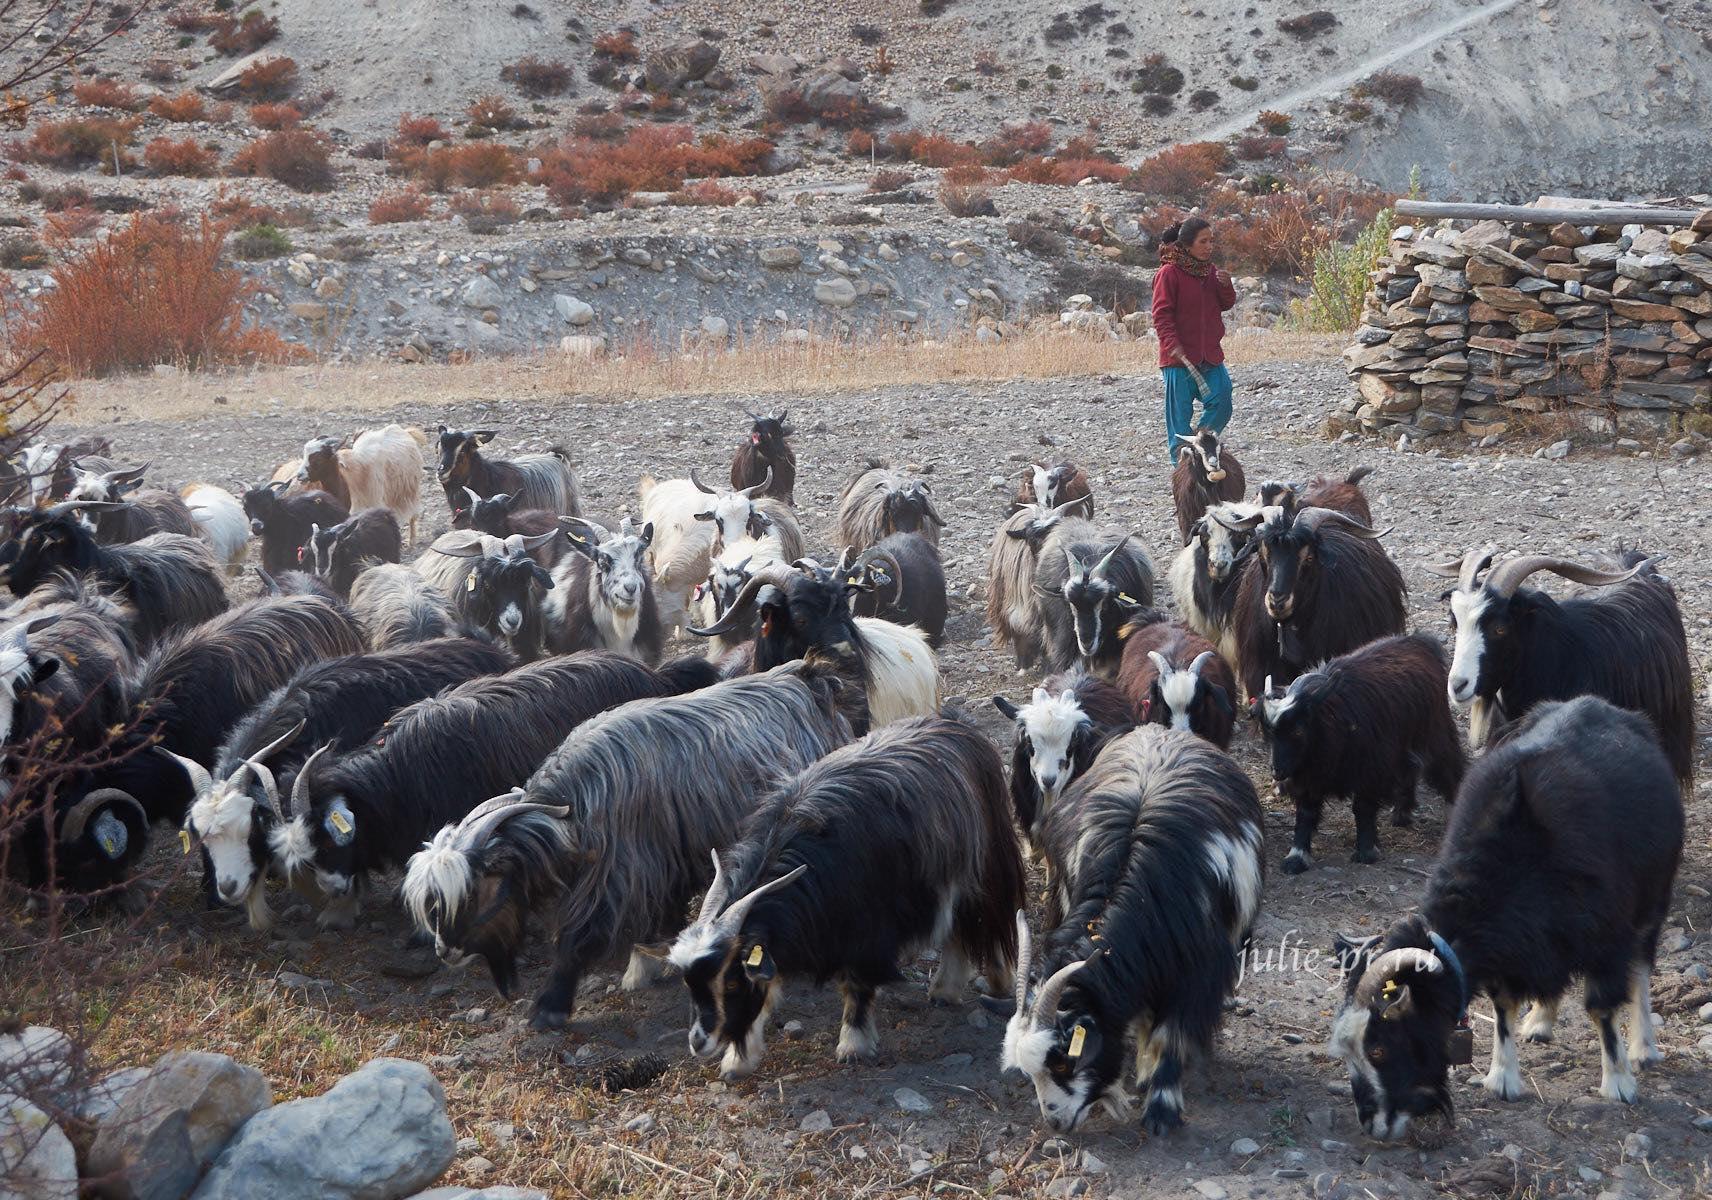 Непал, Трек вокруг Аннапурны, Мананг, Люди, Стадо